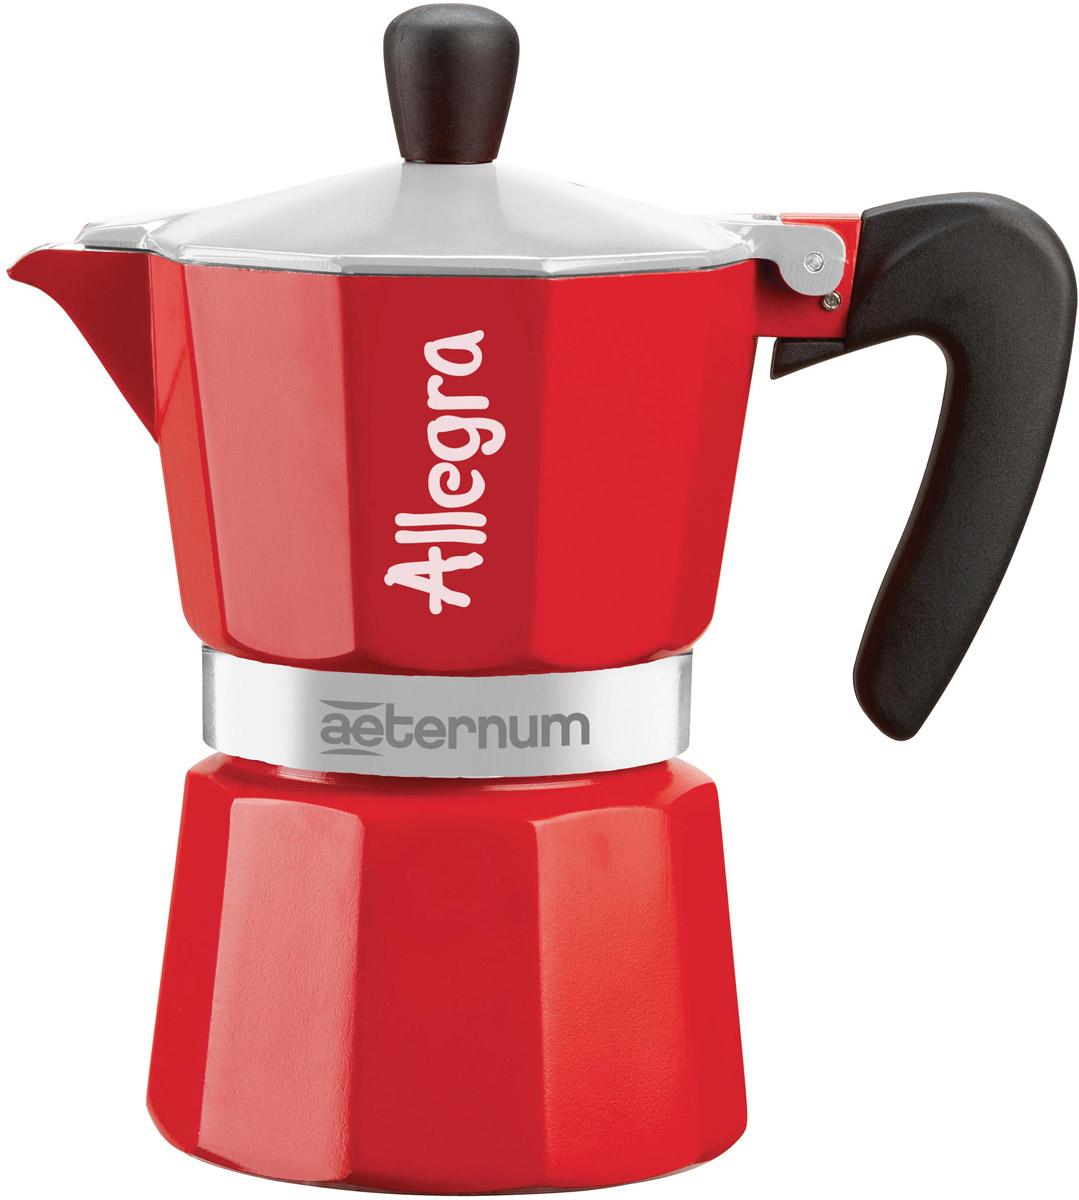 Кофеварка гейзерная Bialetti Aeternum Allegra Rossa, цвет: красный, на 6 чашек